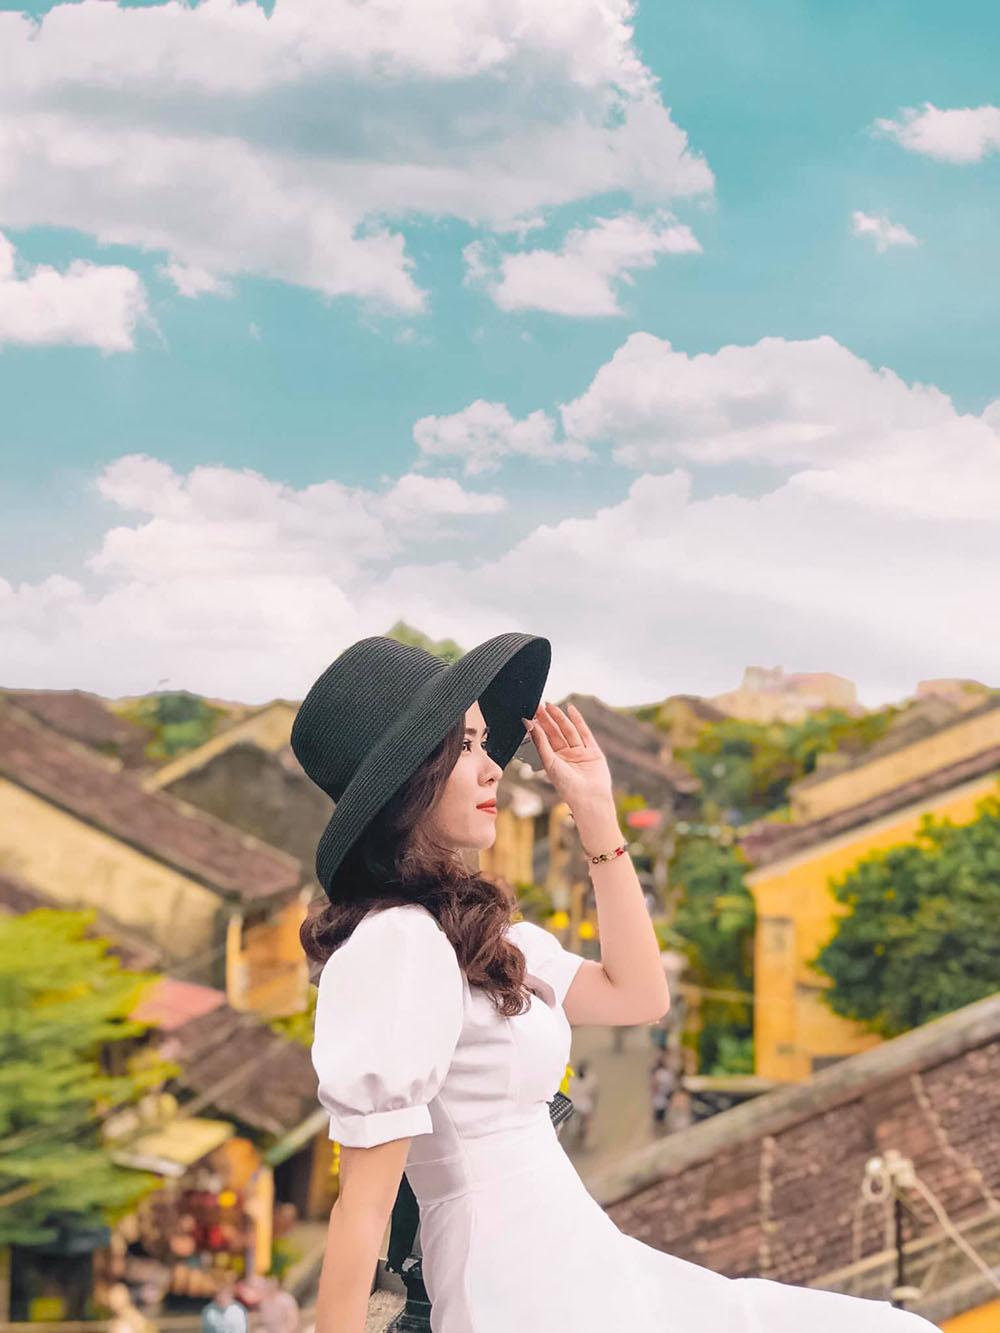 Pho Co Hoi An Review Hue Da Nang Hoi An Ninh Binh 7n7d Chi Voi 8 Trieu Tin Duoc Khong 07